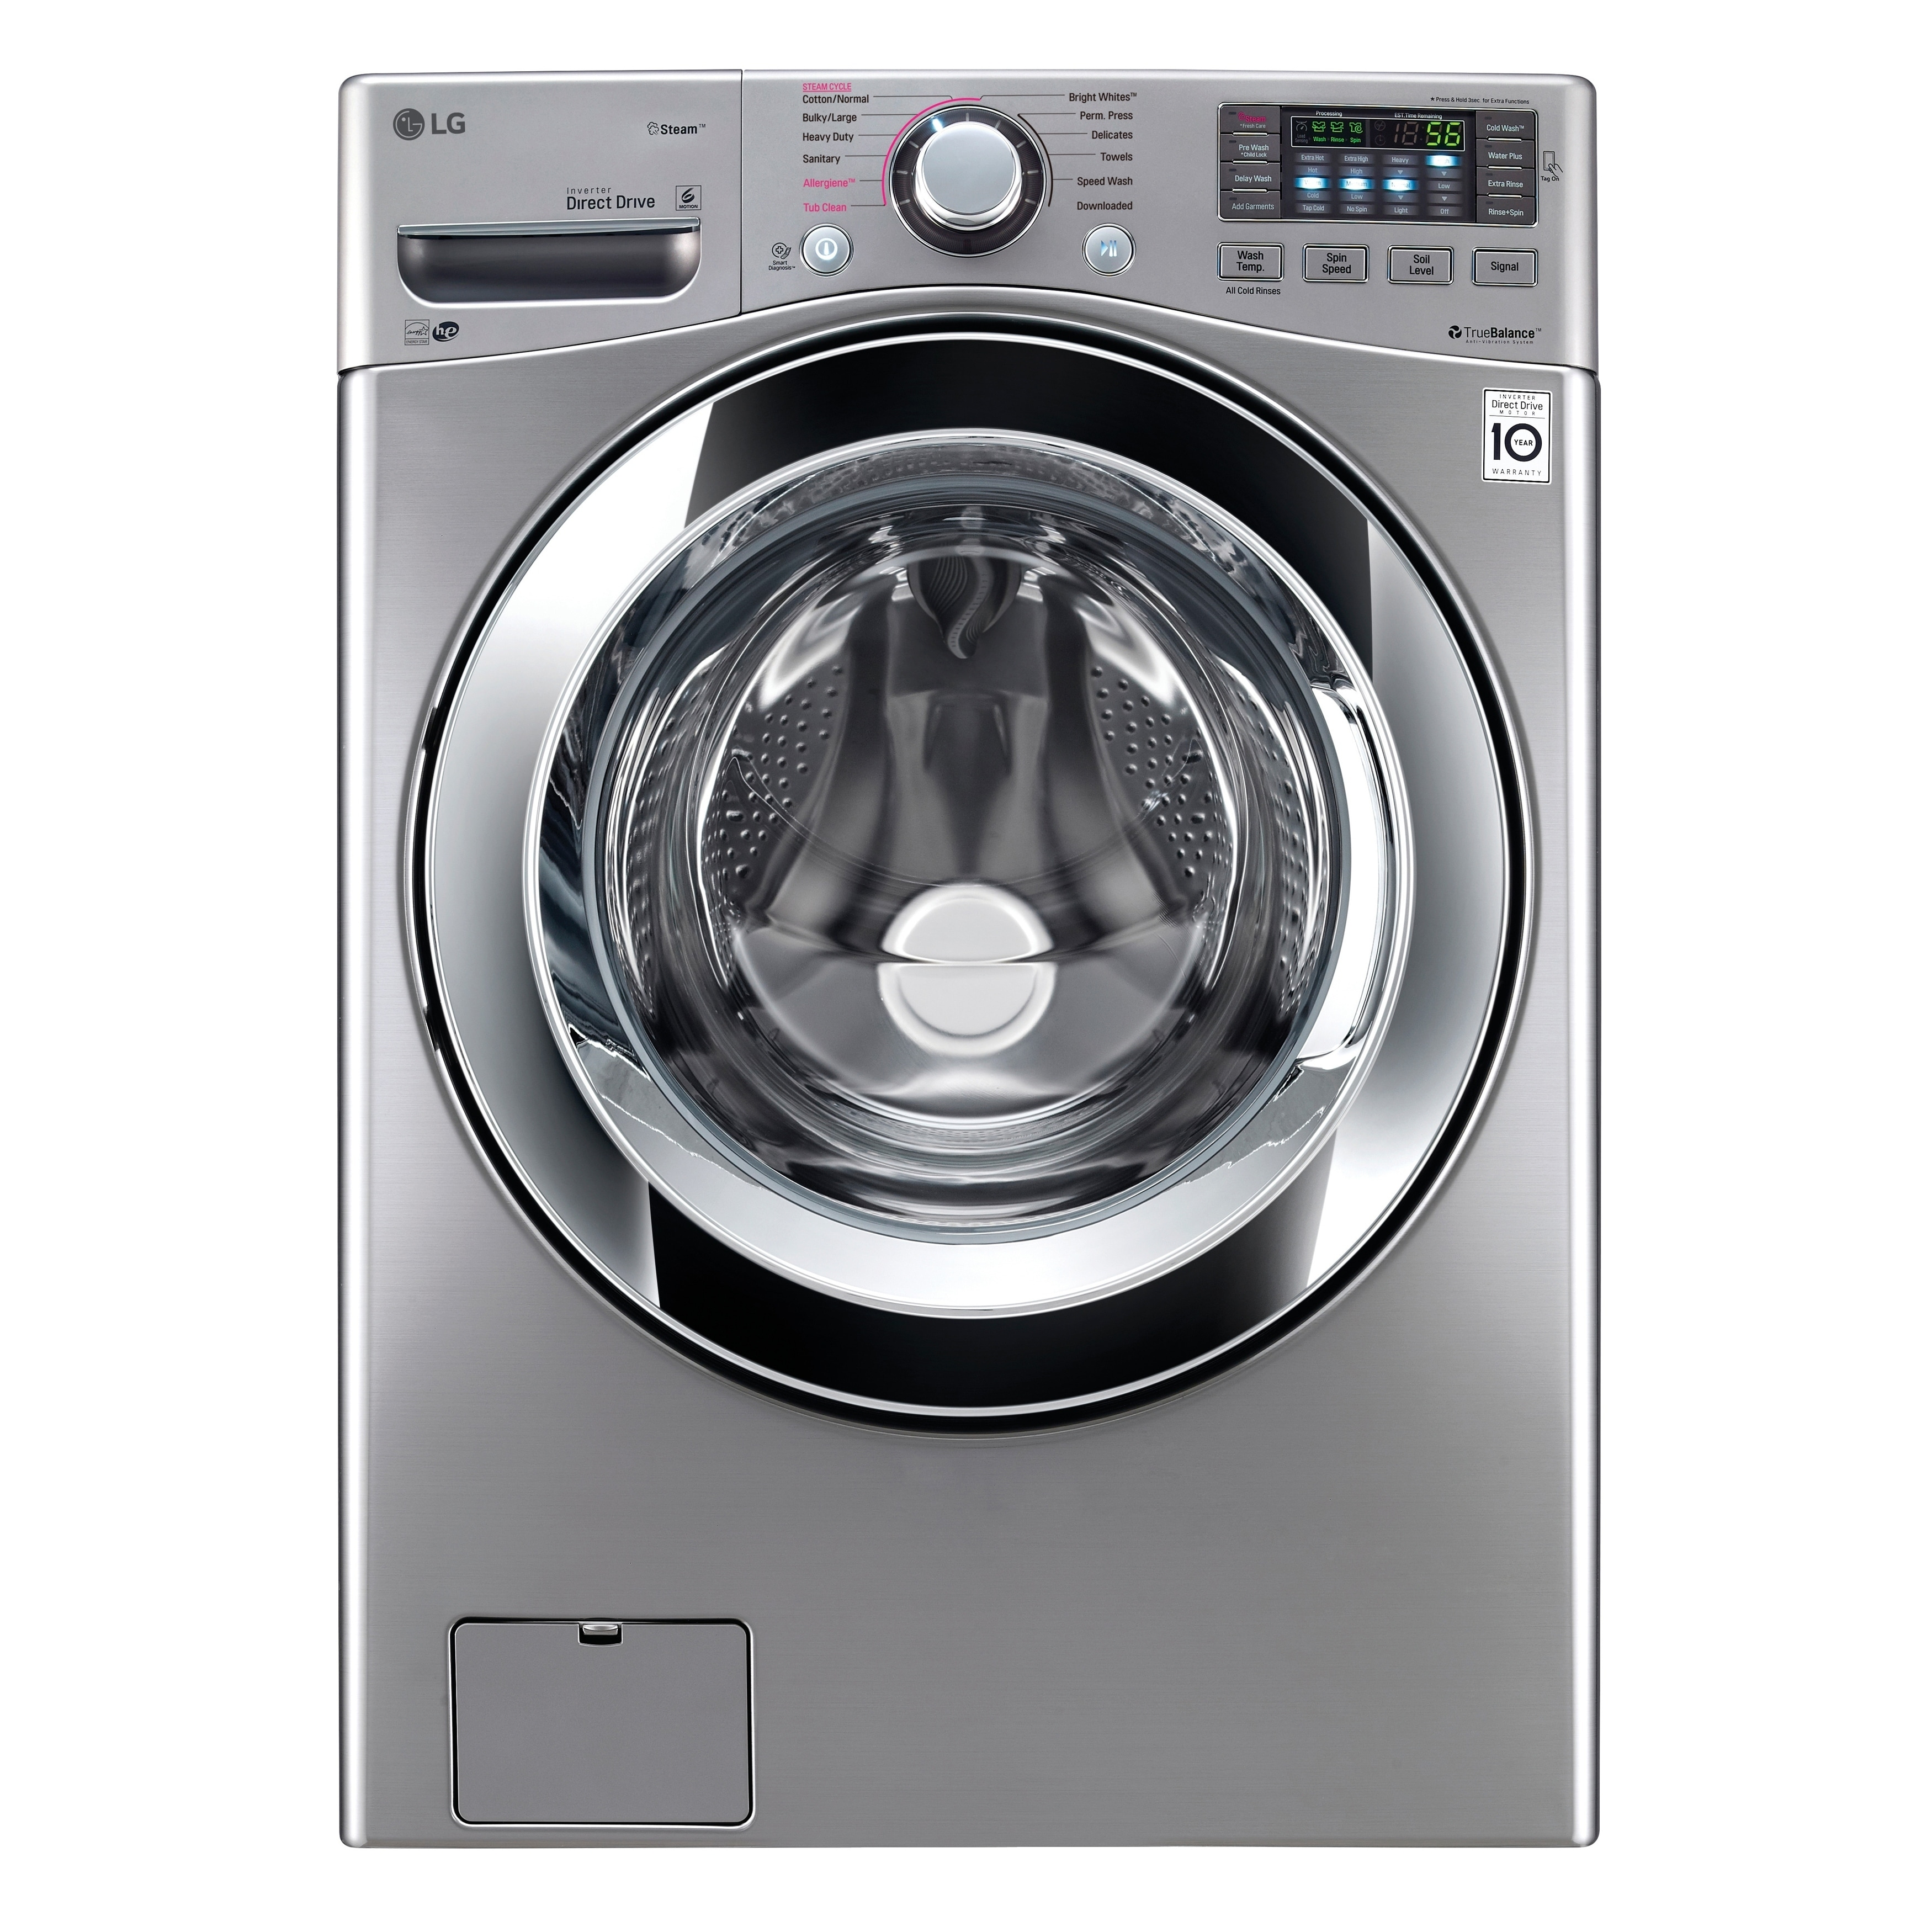 LG WM3670HVA 4.5 cu. ft. Ultra Large Capacity with Steam ...